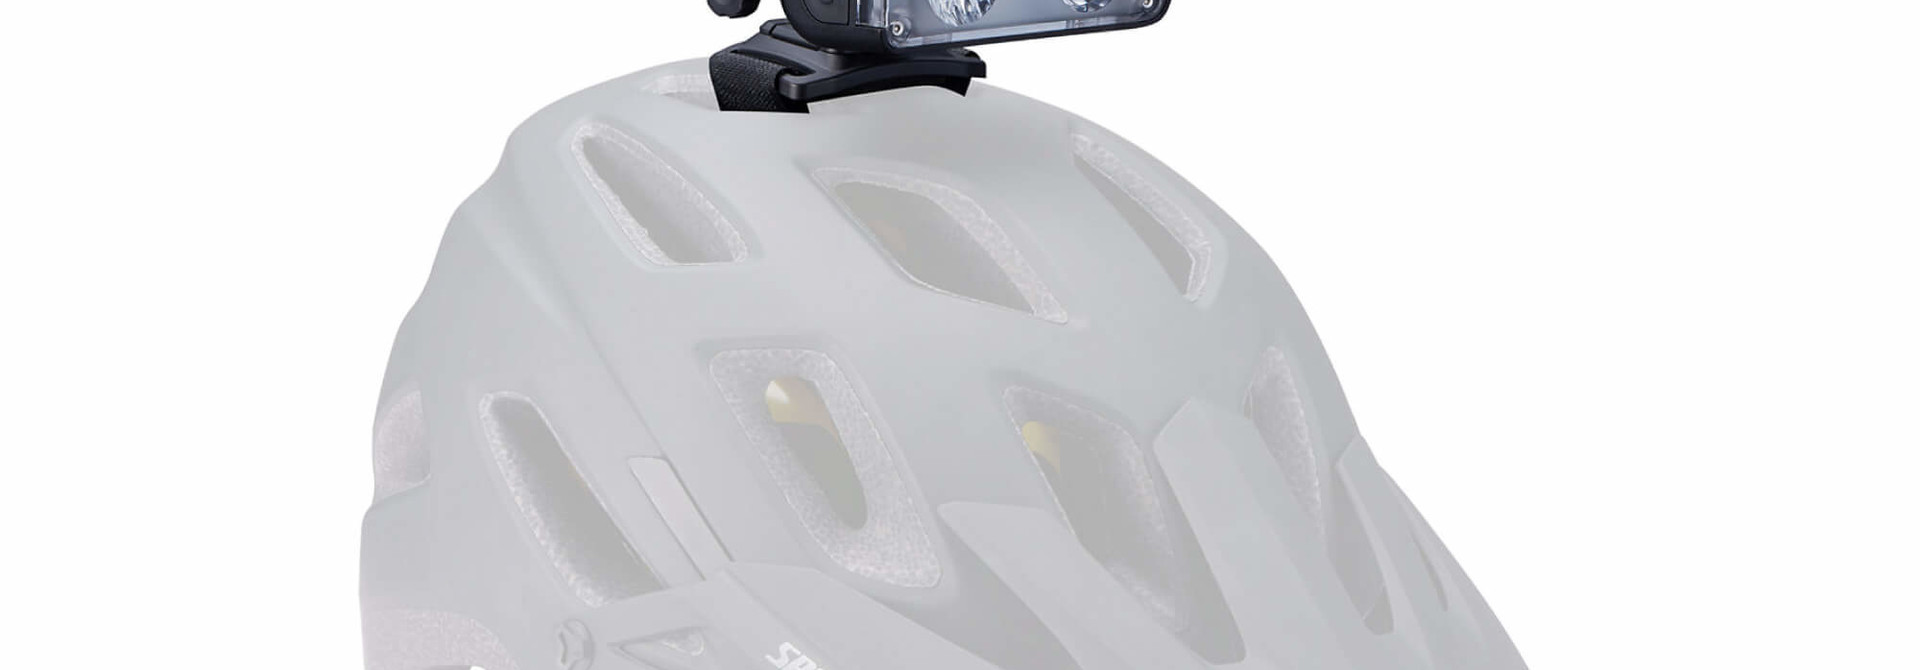 Flux 800 Headlight